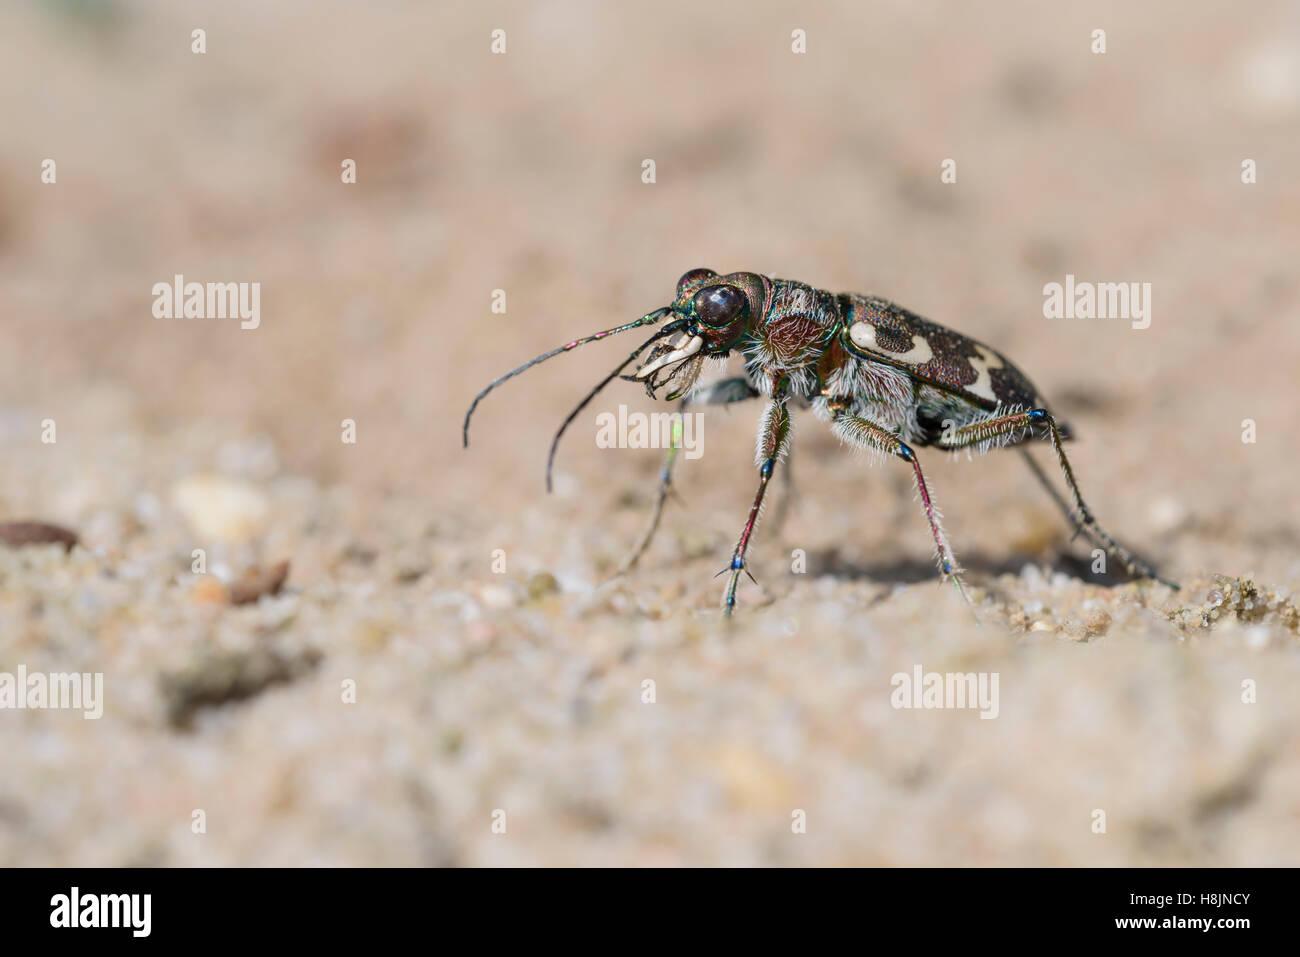 Duenen-Sandlaufkaefer, Cicindela hybrida, Northern Dune Tiger Beetle - Stock Image